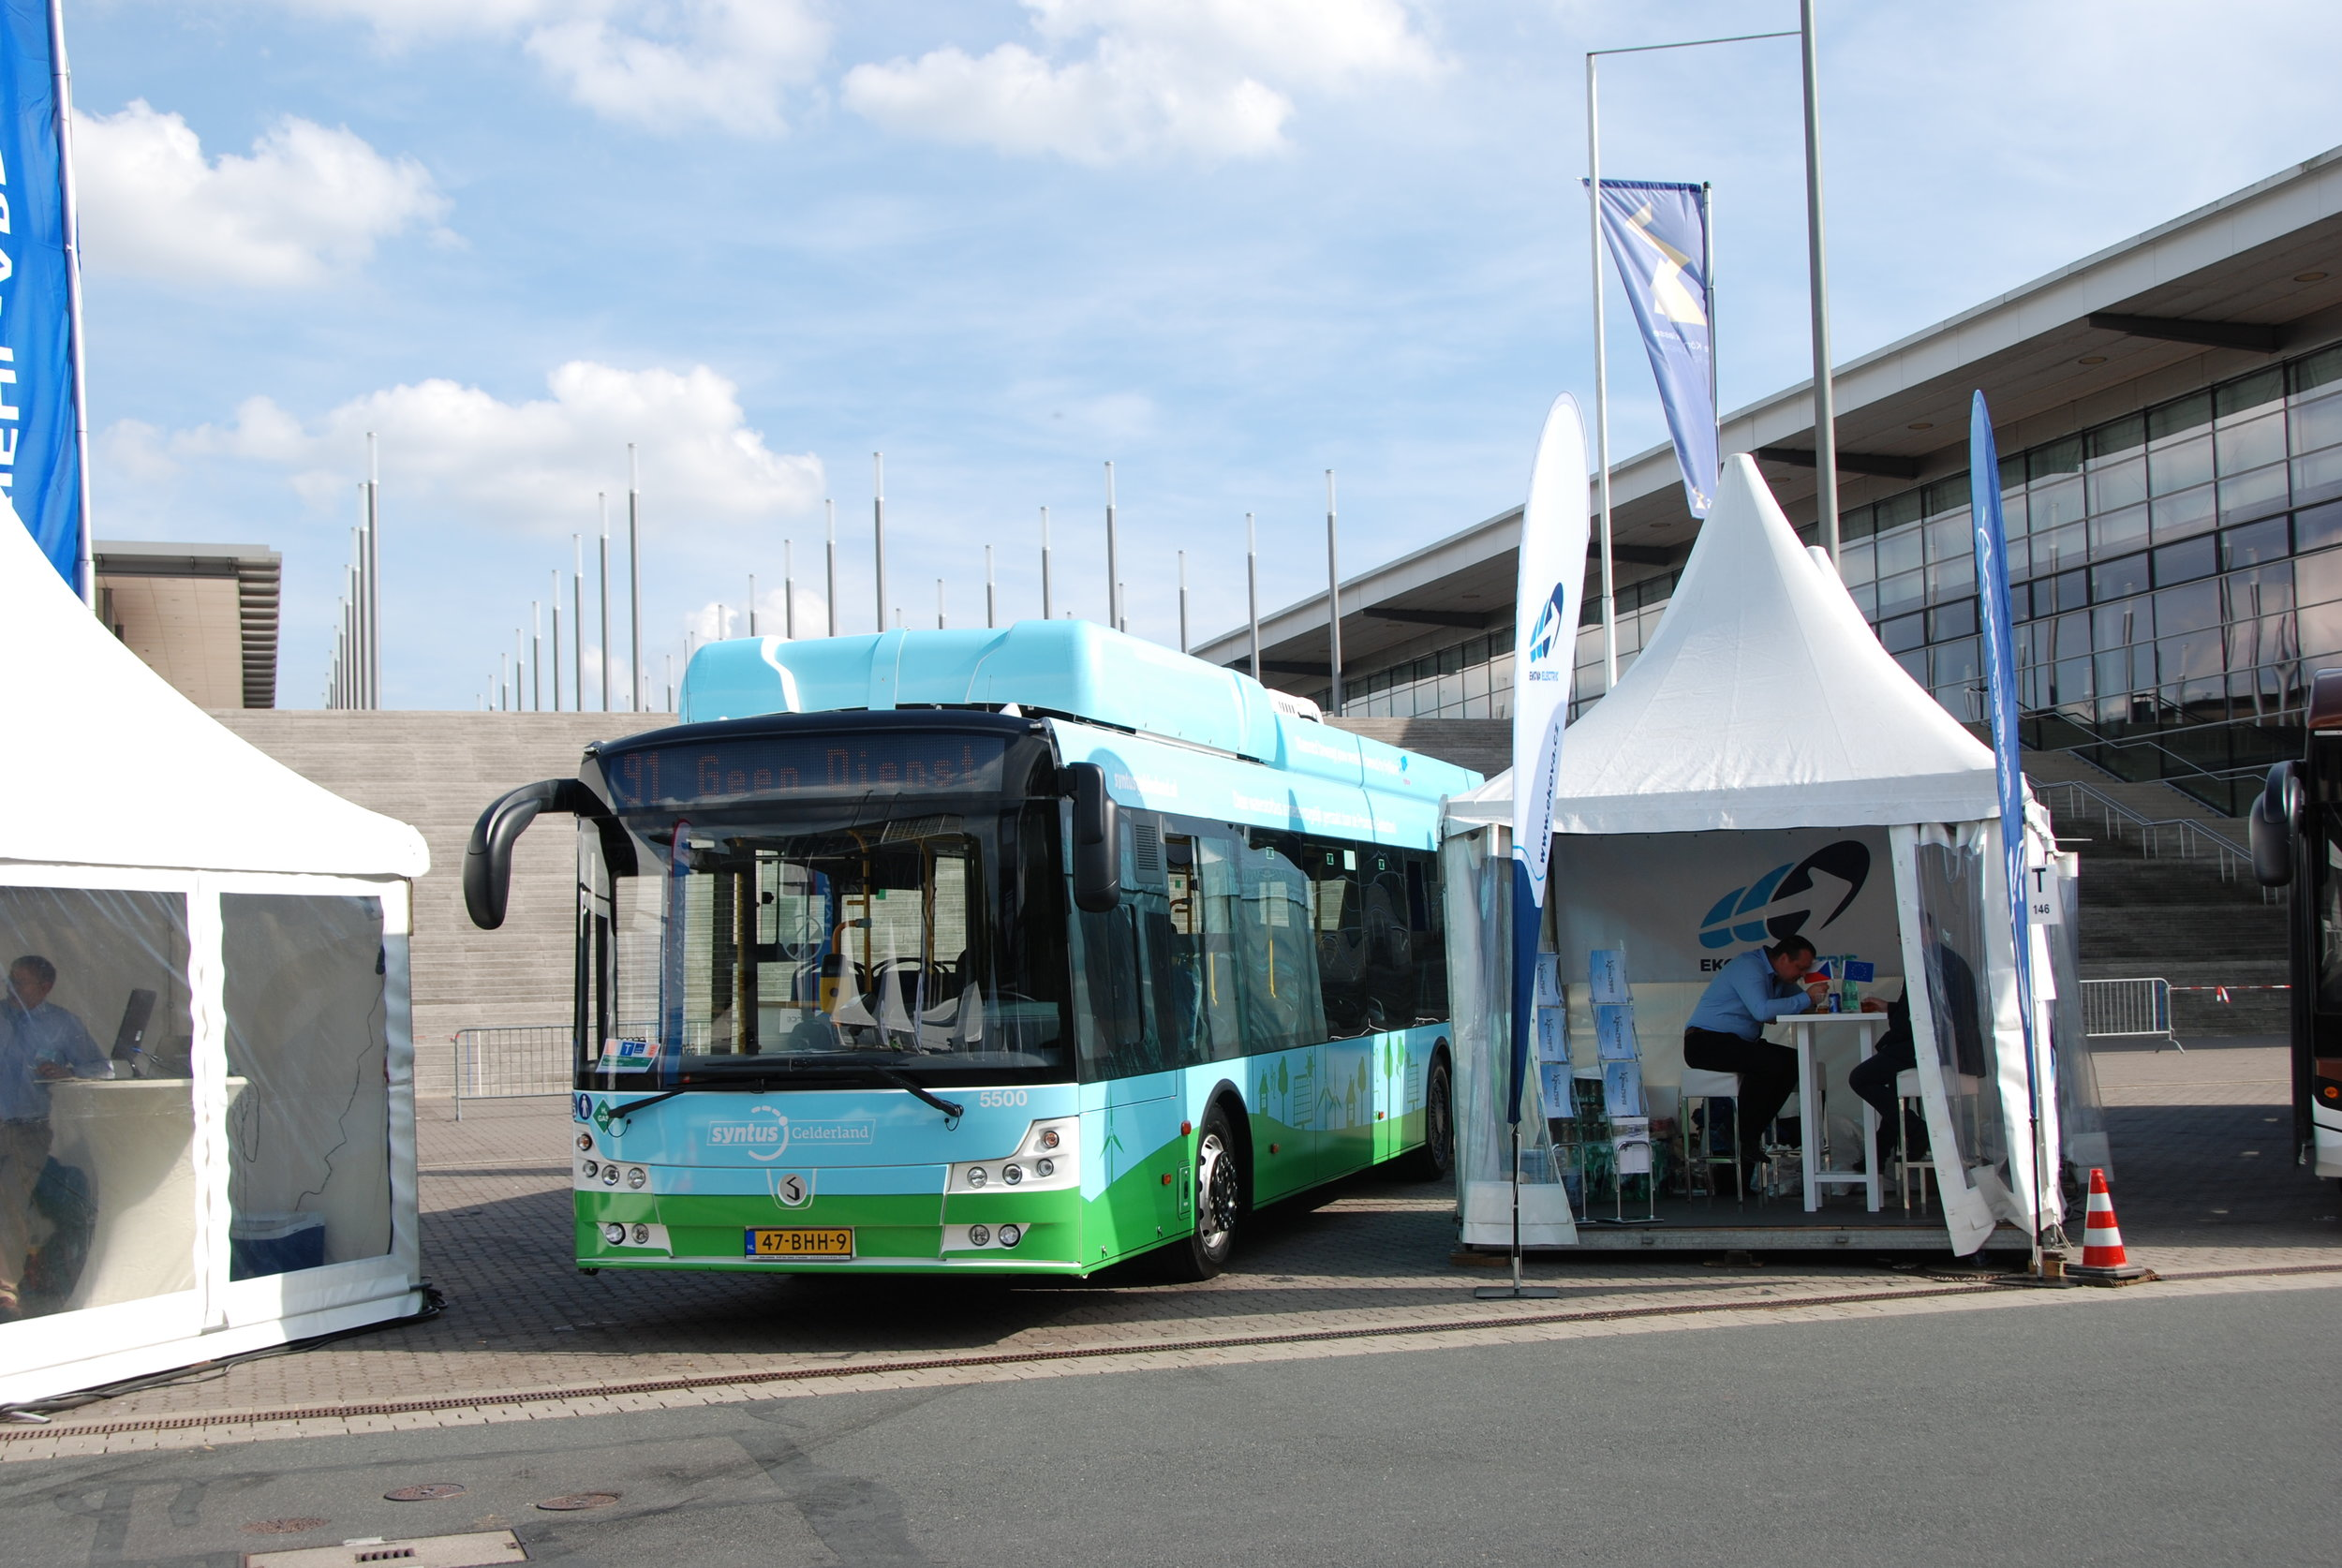 Autobus Solbus na stánku společnosti Ziehl-Abbeg. (foto: Libor Hinčica)